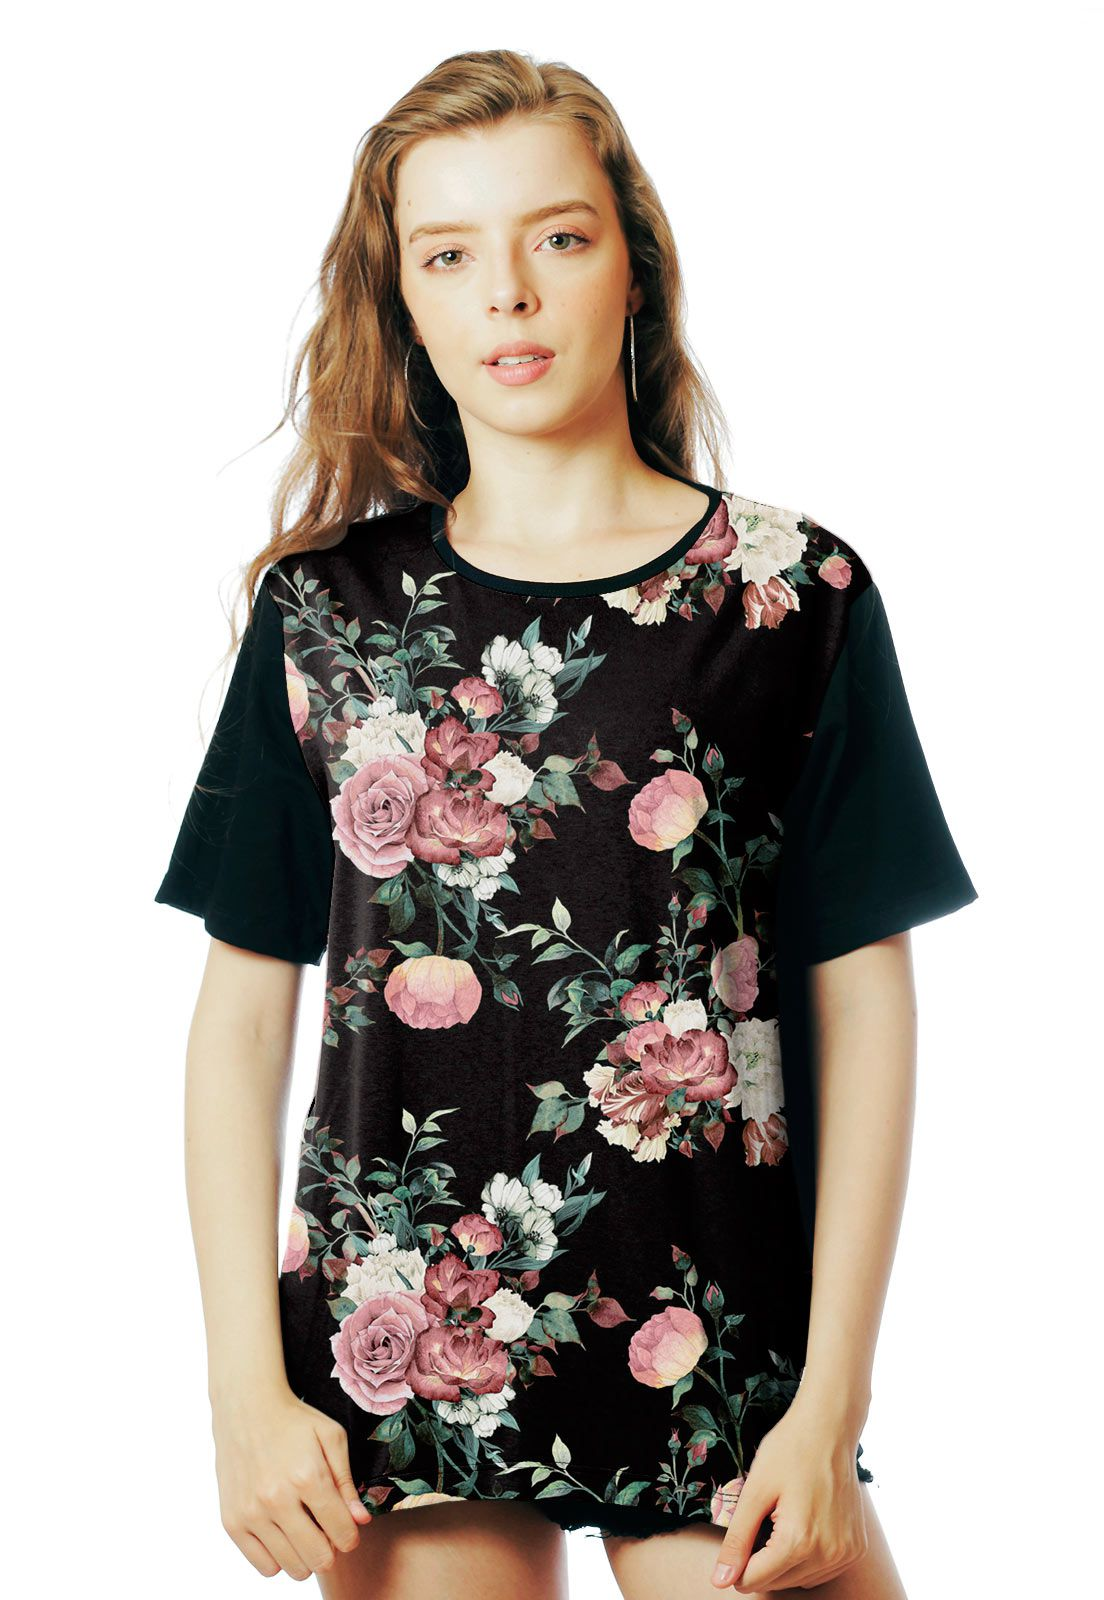 Camiseta Florida ElephunK Estampada Roseiral Floral Dark Preta